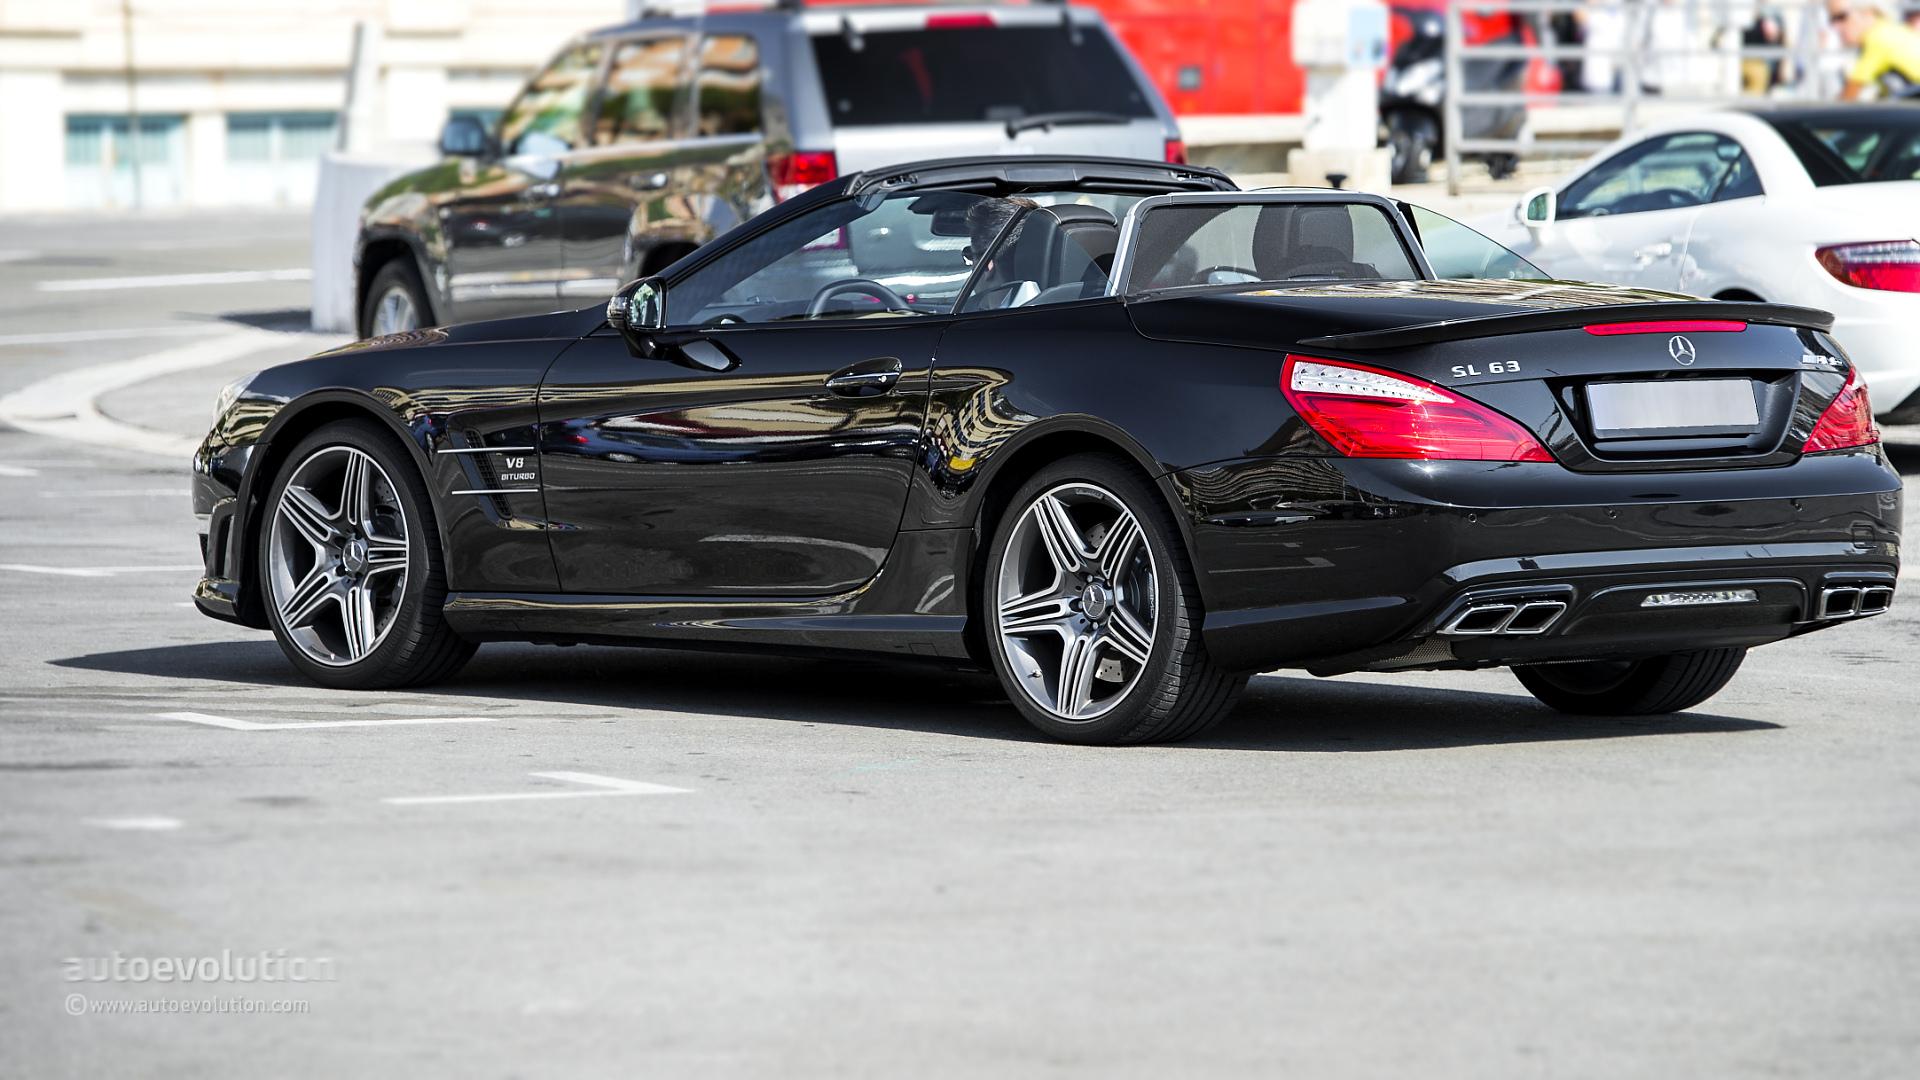 2018 Mercedes Sl63 Amg >> Pictures: 2014 Mercedes Benz SL63 AMG - PakWheels Blog